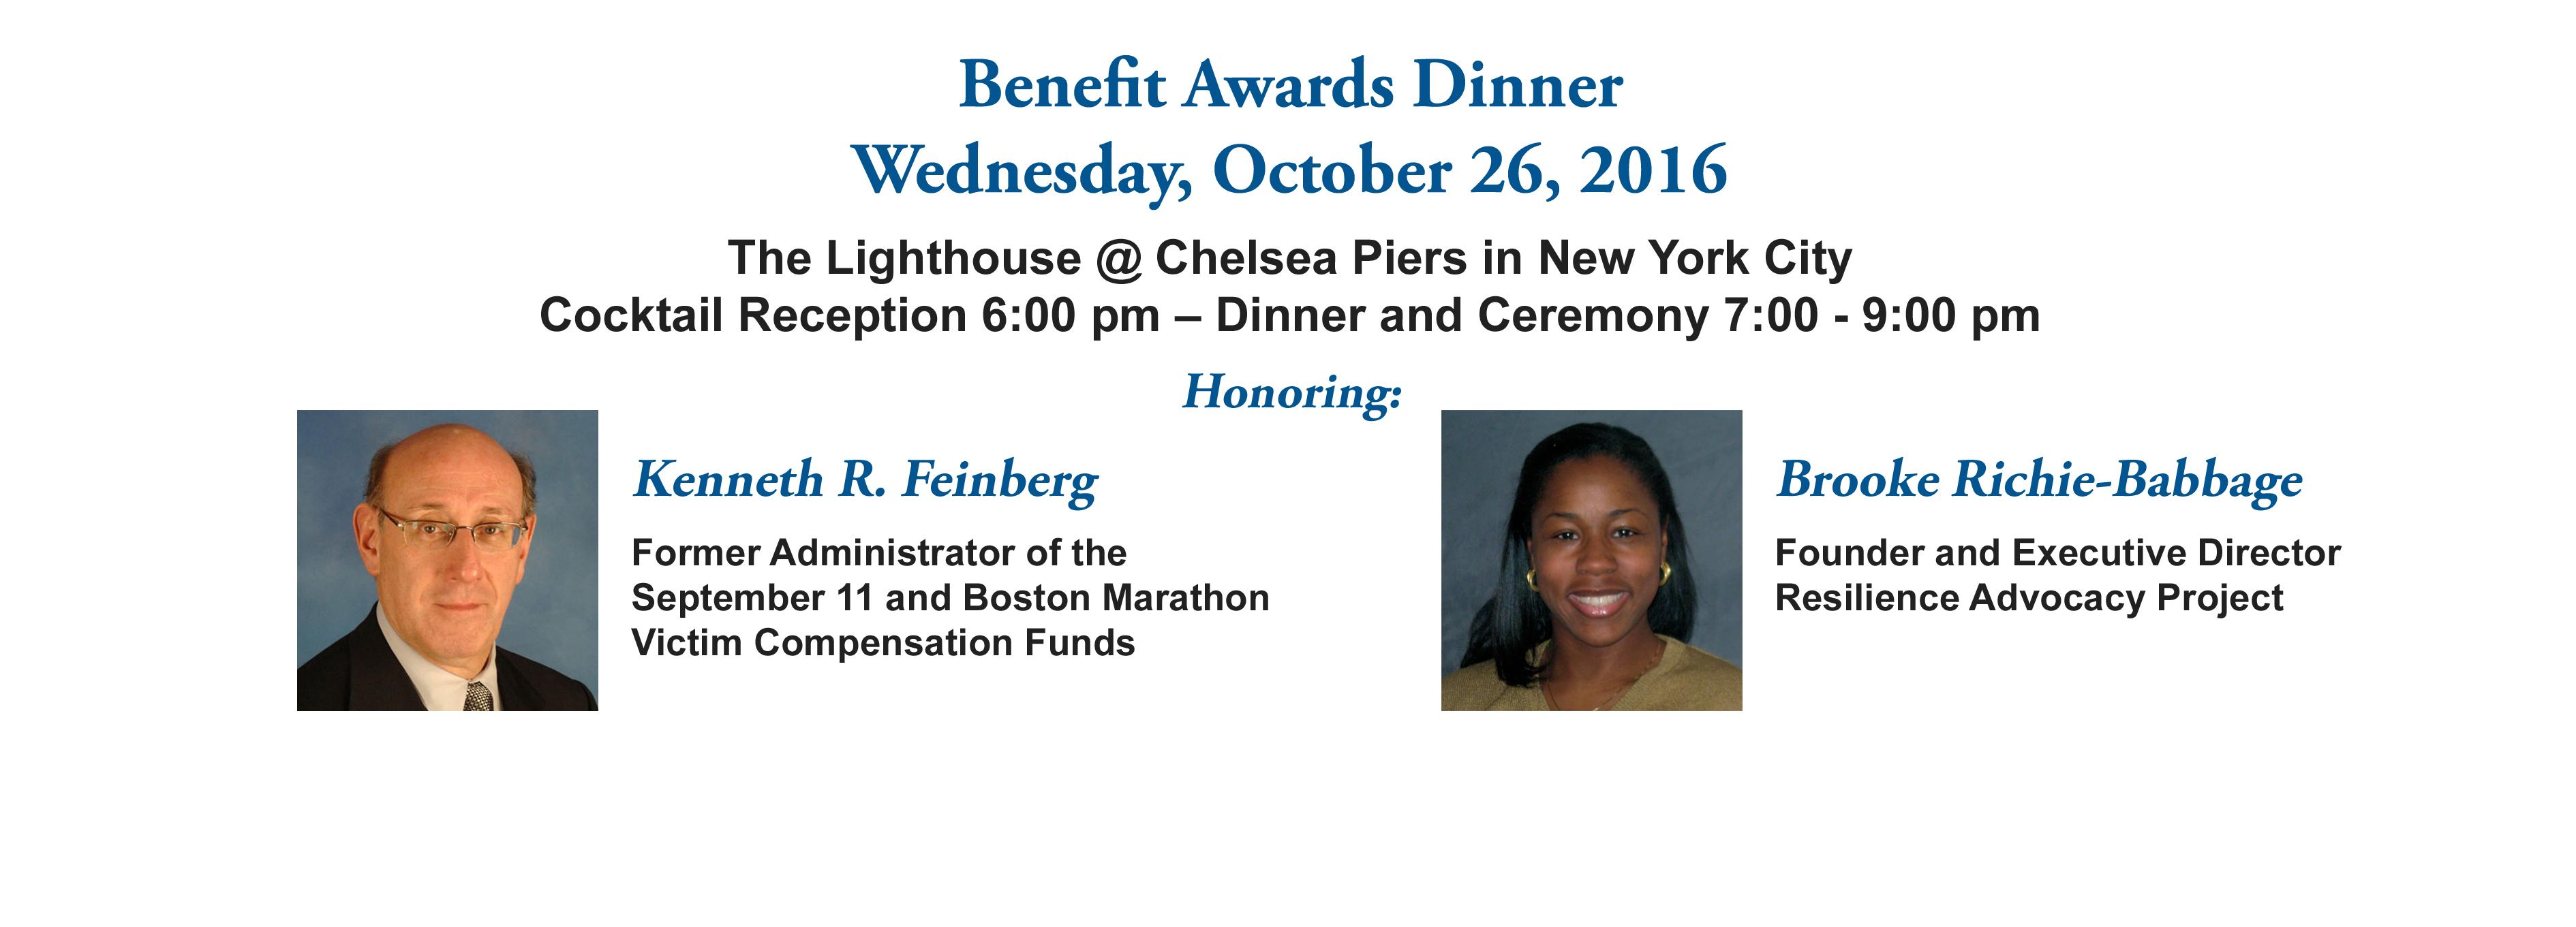 2016 Benefit Awards Dinner